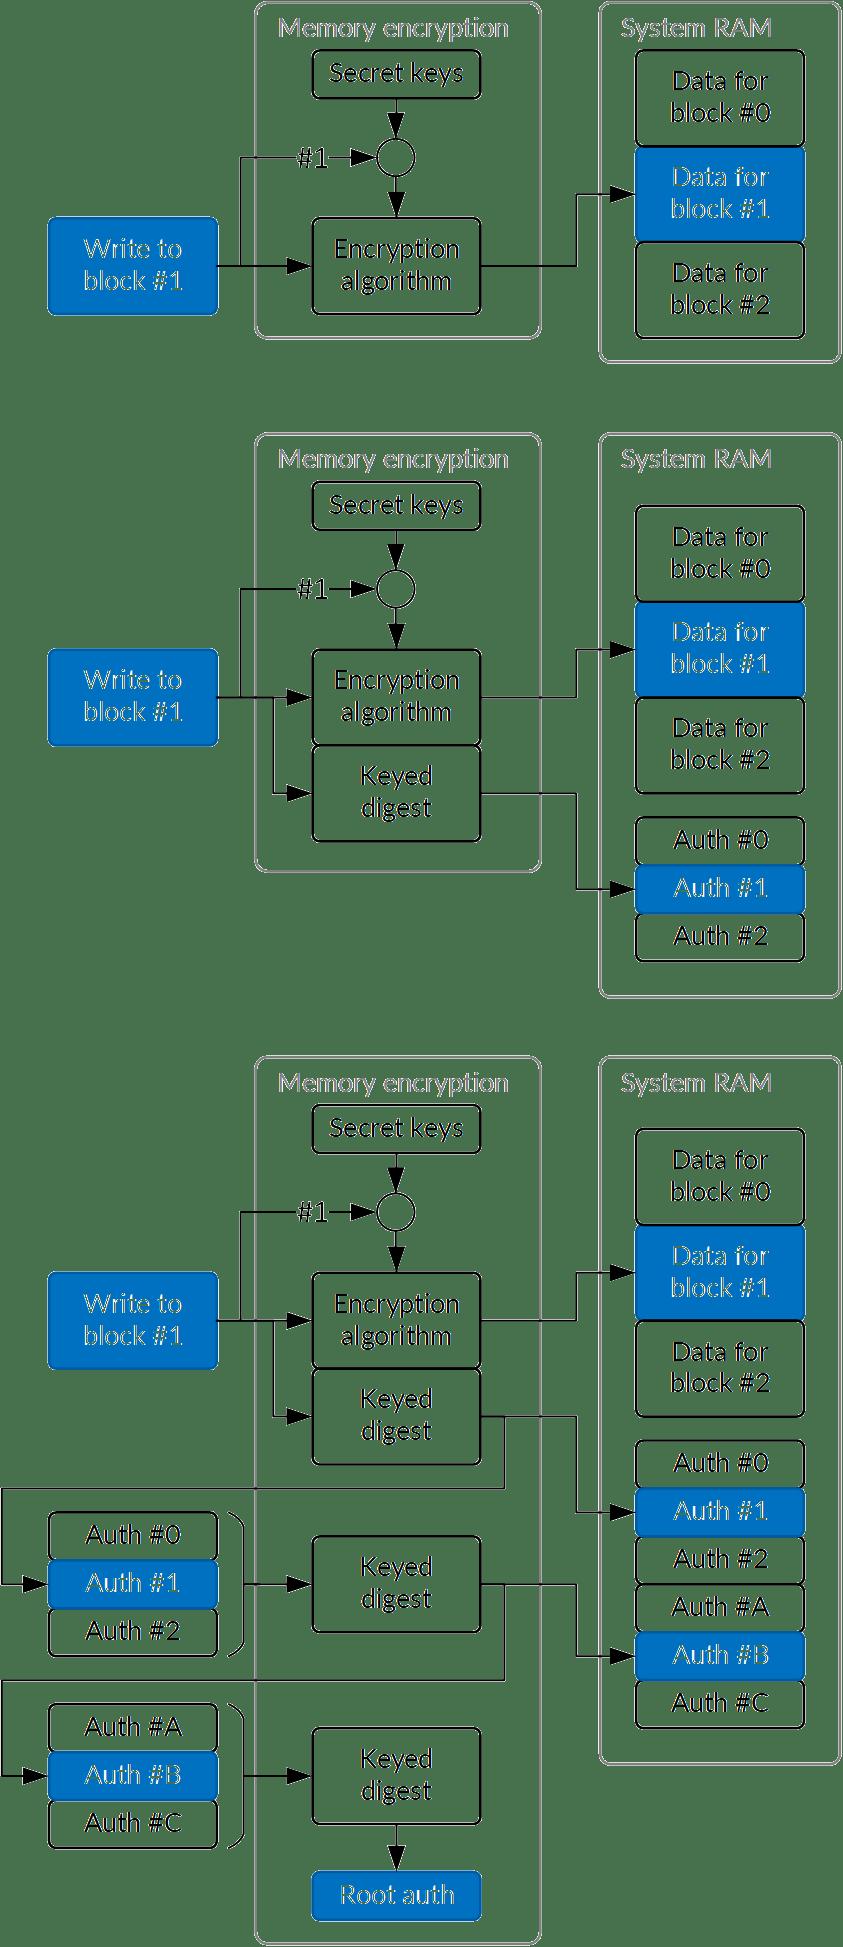 Fig 11: The three memory encryption models